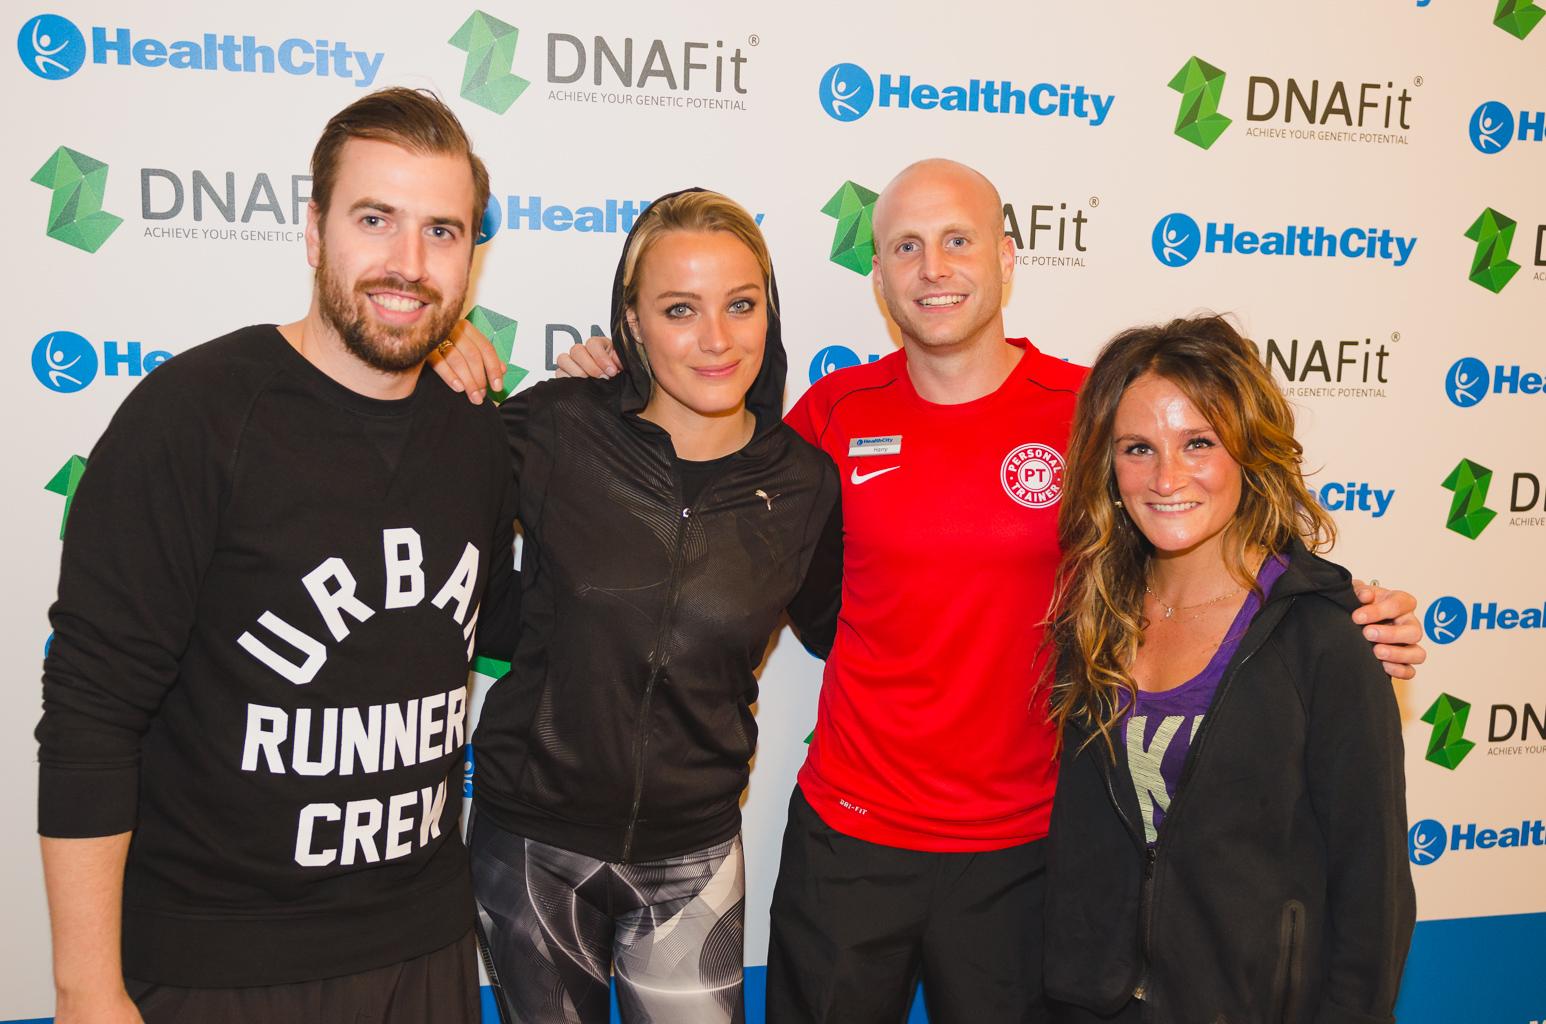 20140917 Healthcity DNAFit-044